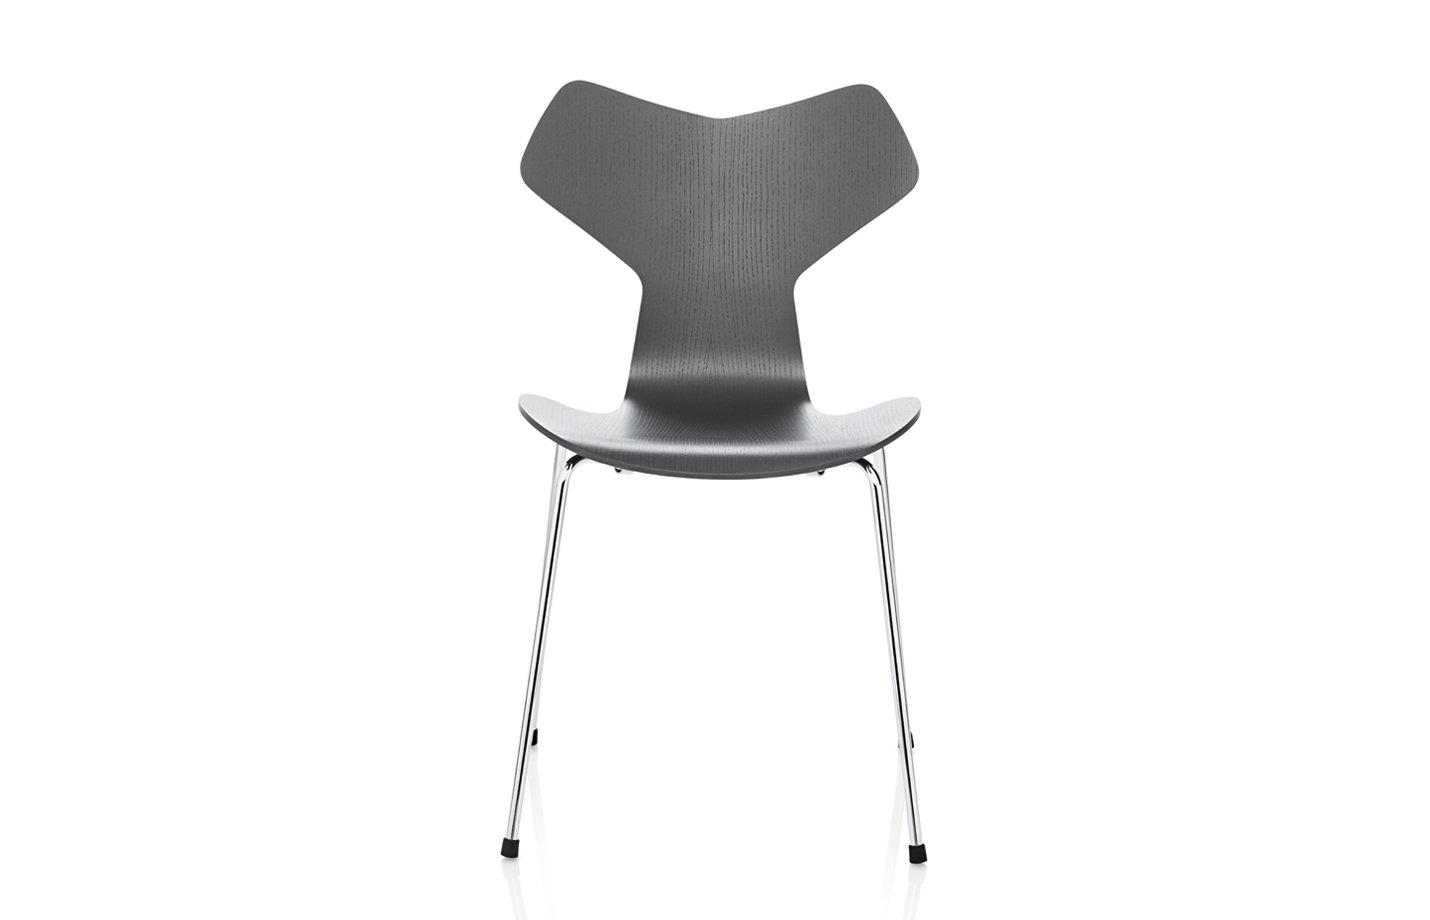 Grand prix chair – Grey